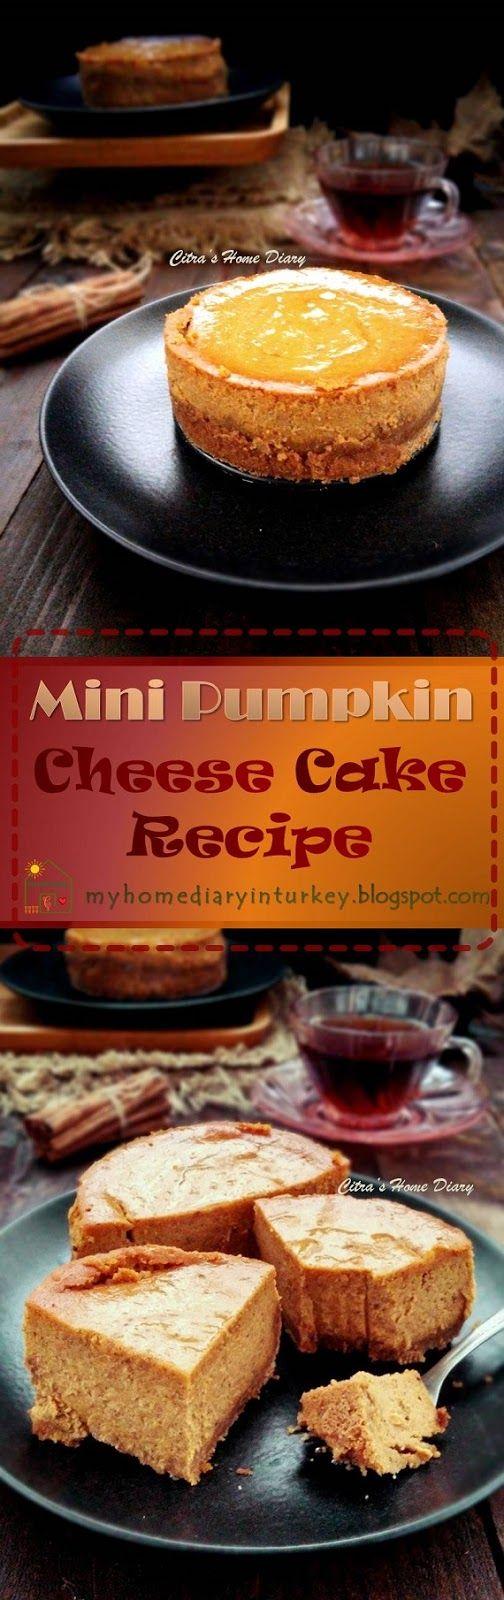 Mini Pumpkin CheeseCake / Cheesecake labu kuning-Çitra's Home Diary